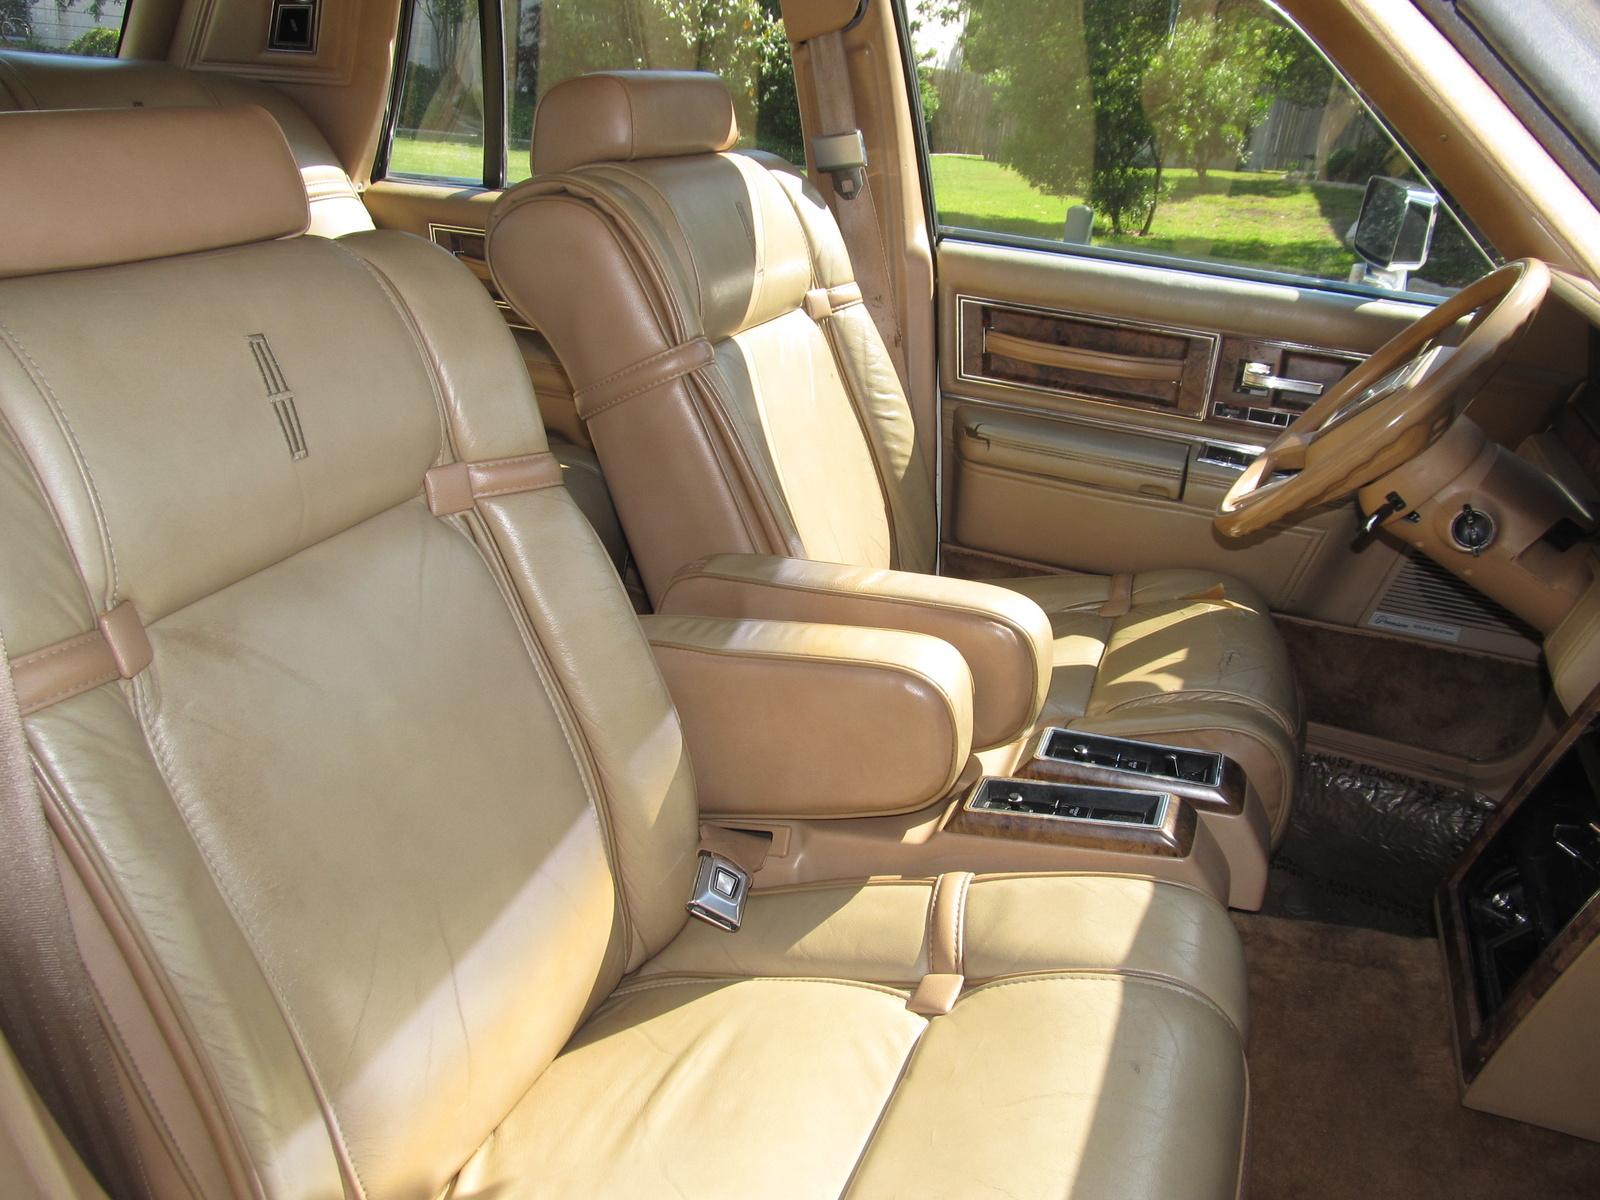 1983 Lincoln Continental Interior Pictures Cargurus